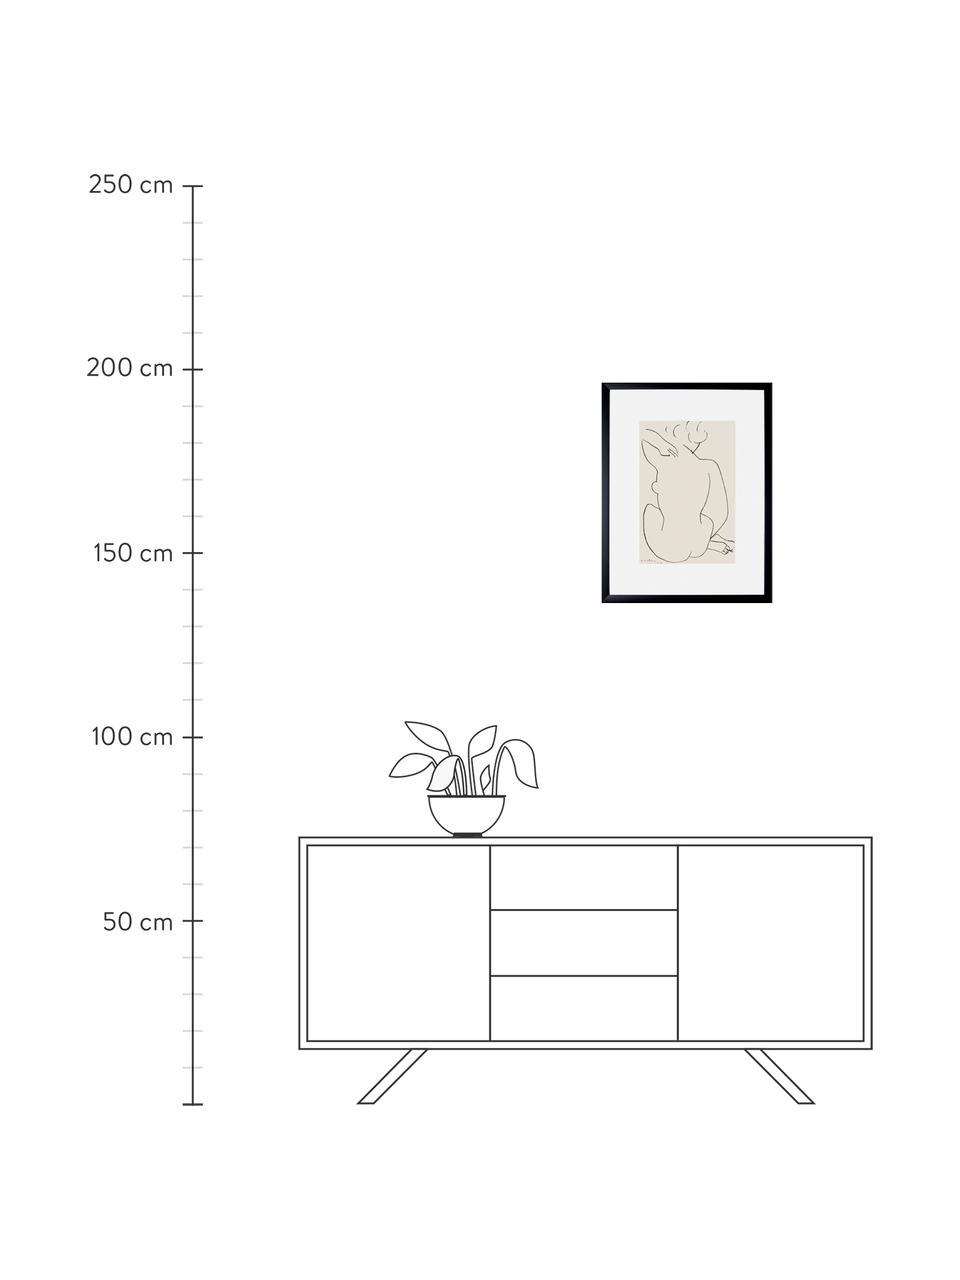 Gerahmter Digitaldruck Matisse: Nu Accroupi, Bild: Digitaldruck, Rahmen: Kunststoffrahmen mit Glas, Mehrfarbig, 43 x 60 cm